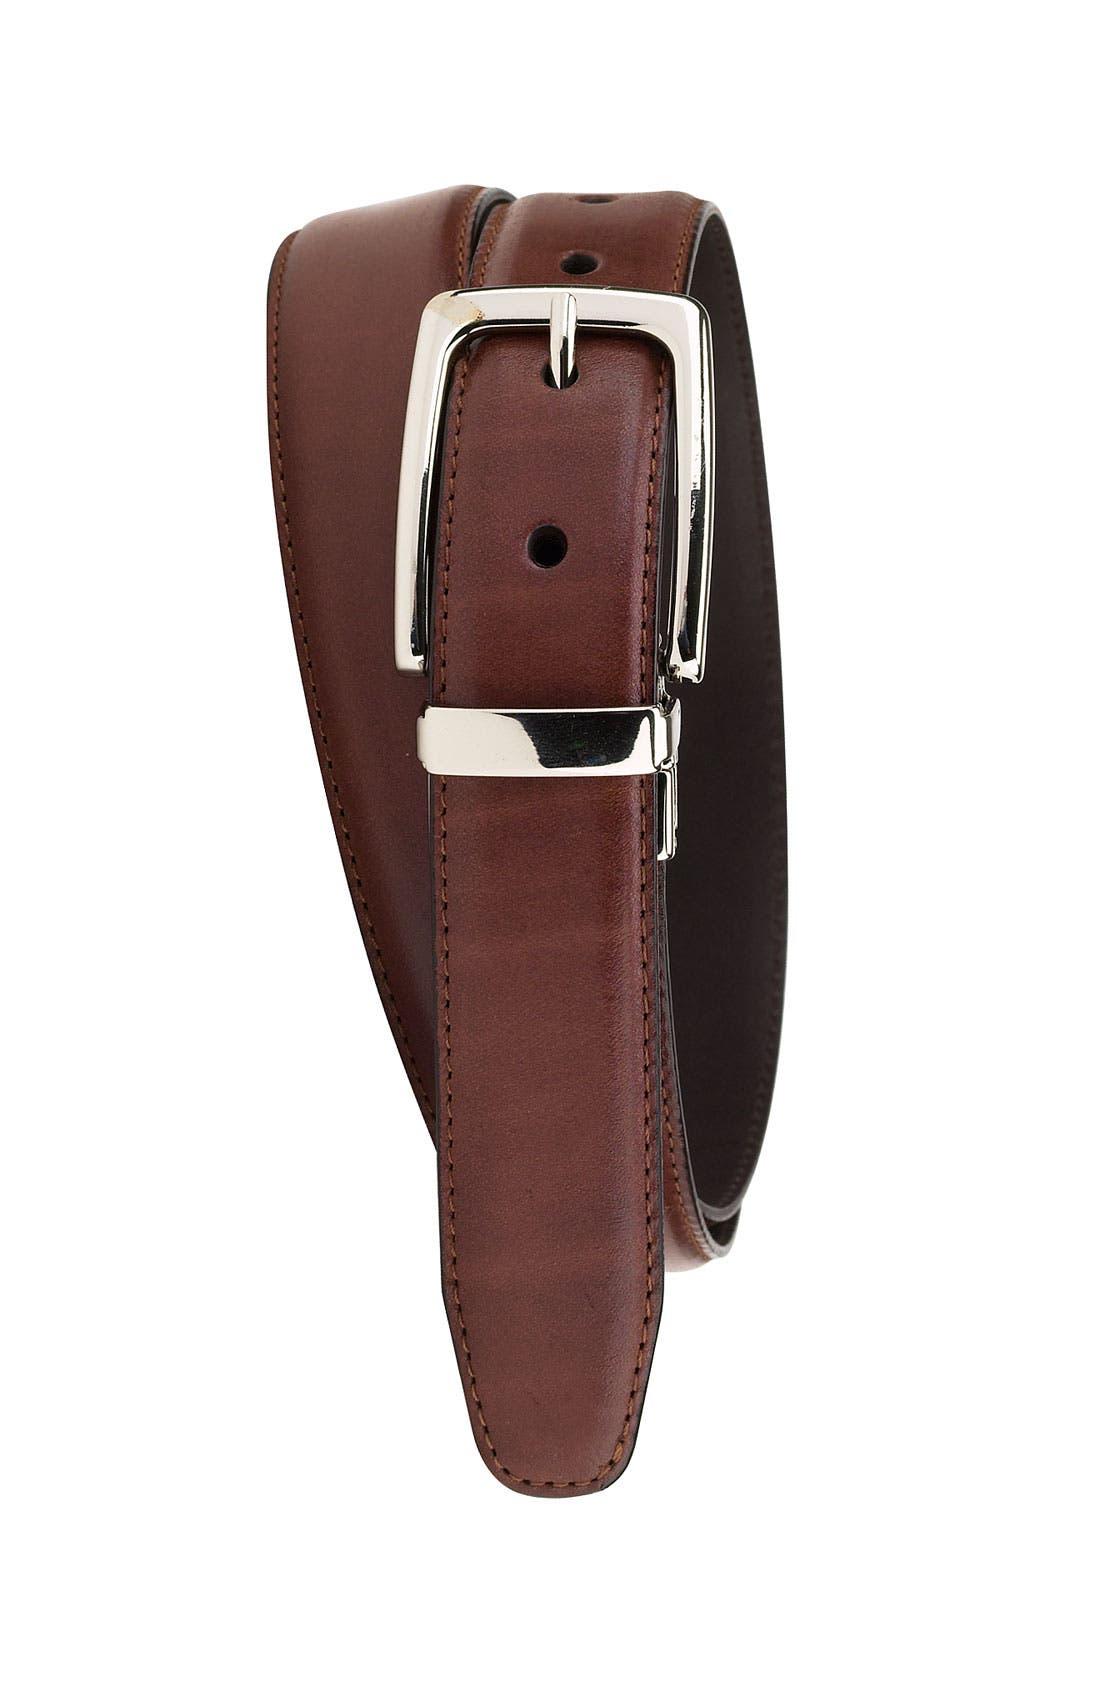 Main Image - Cole Haan 'Wheaton' Leather Belt.